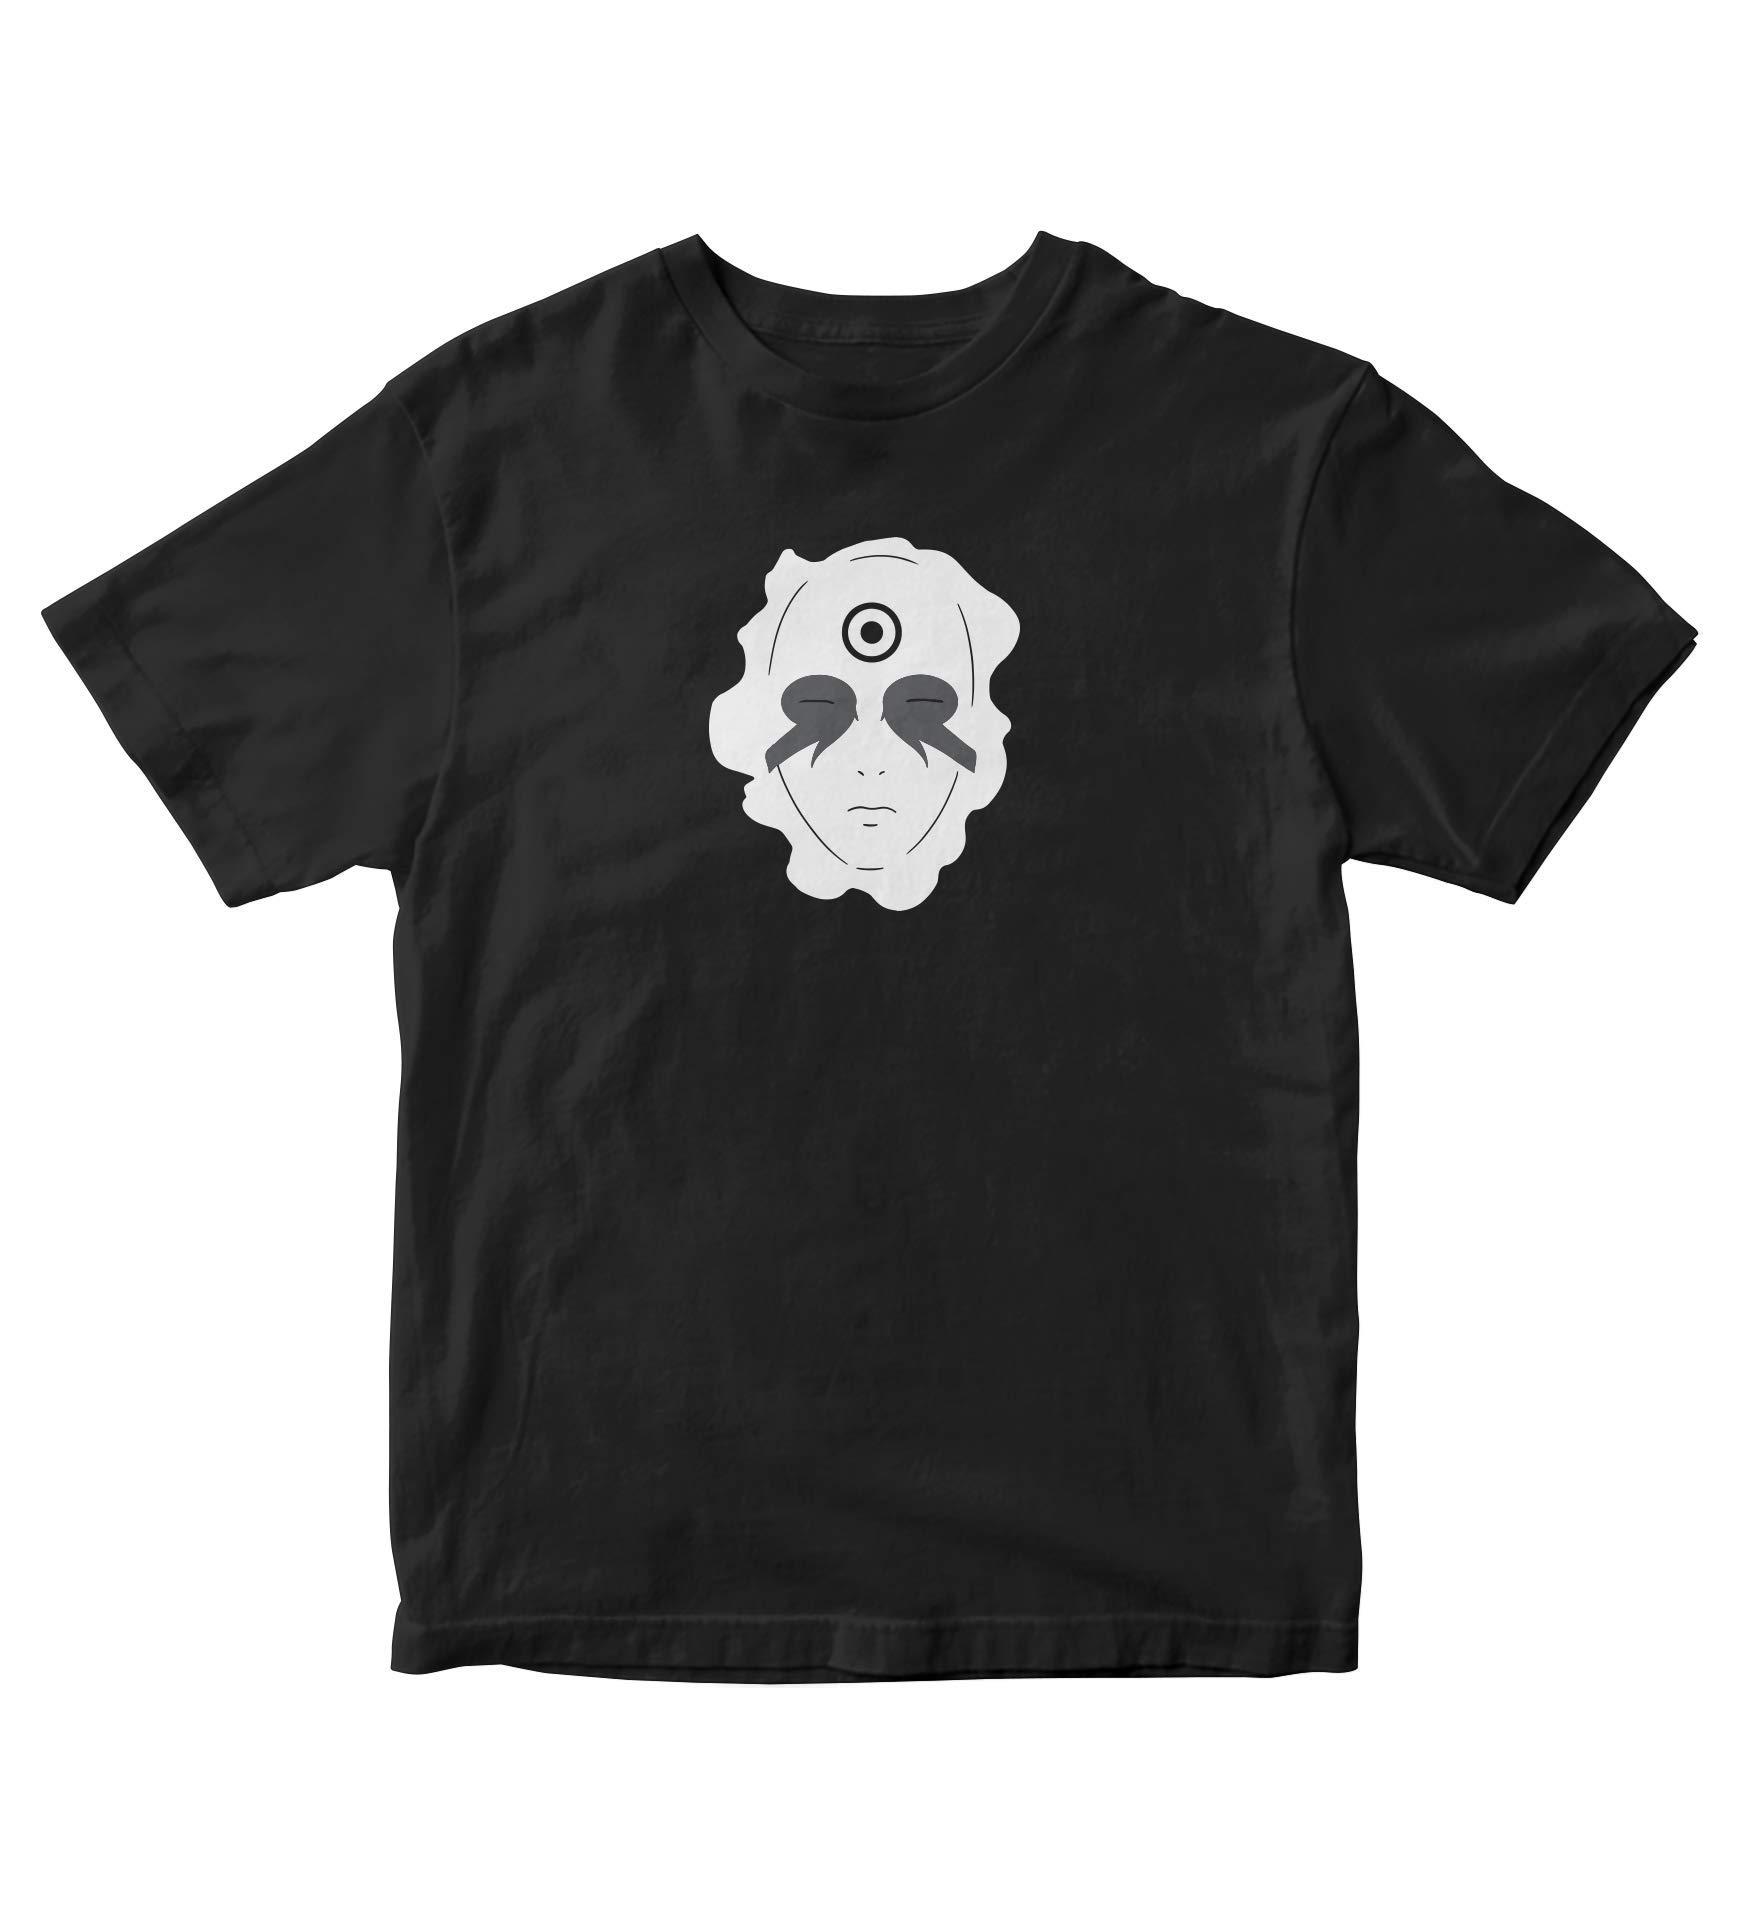 Tjsports Madara Uchiha Shirt Chest Face Naruto Anime Manga Man S Black A822